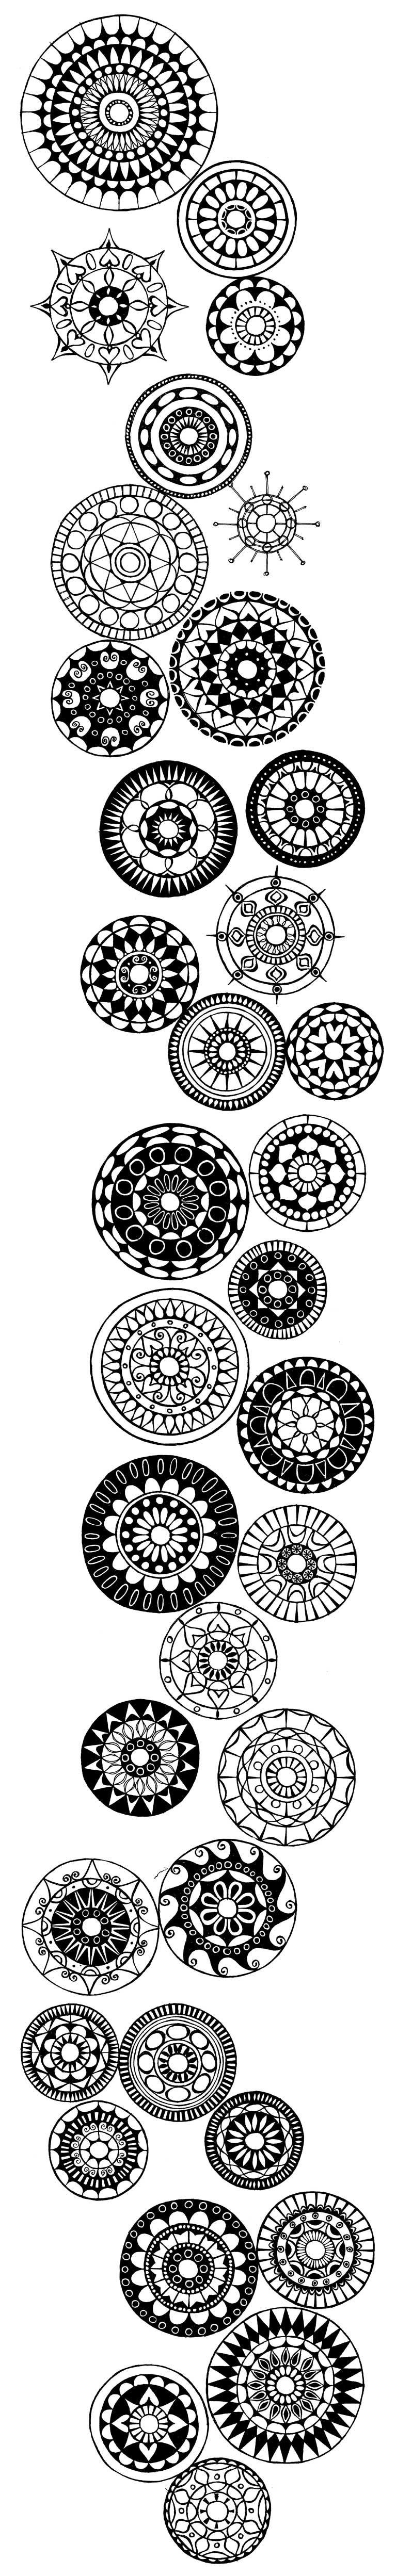 The doodler | diseño texturas | Pinterest | Mandalas, Guirnalda de ...